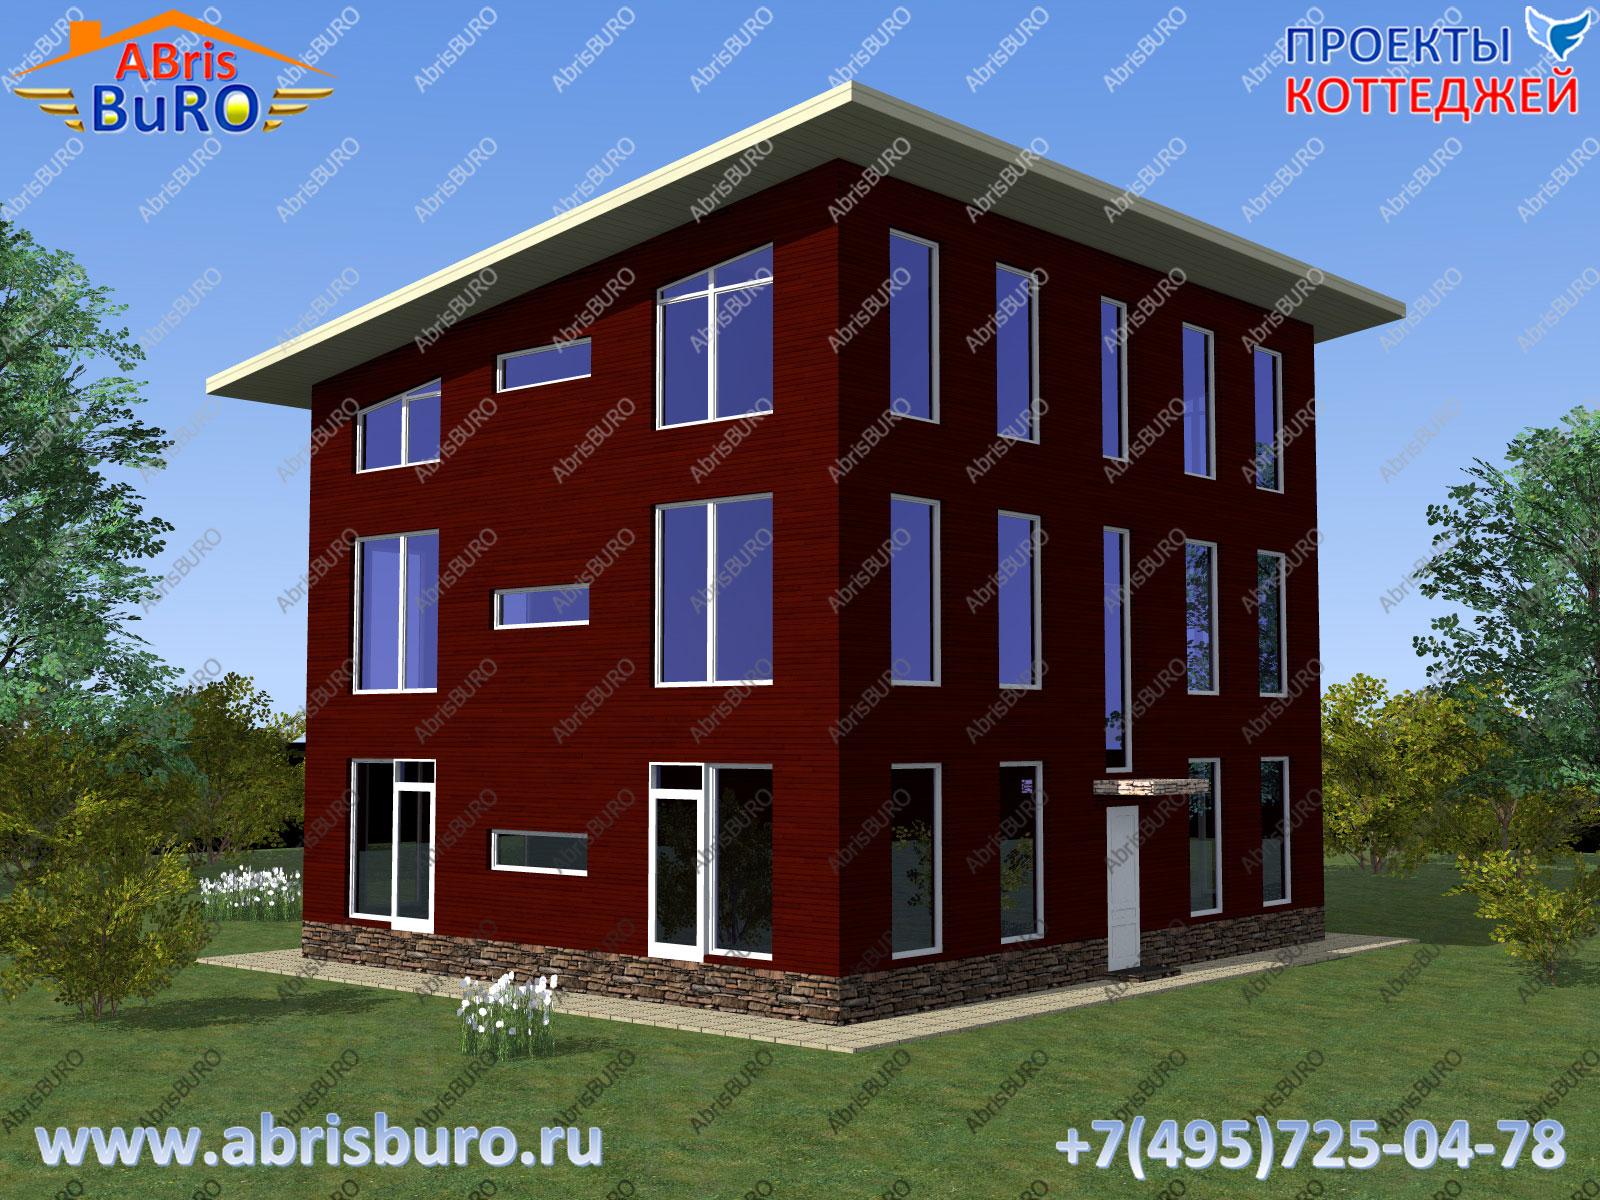 Фасад дома 3d